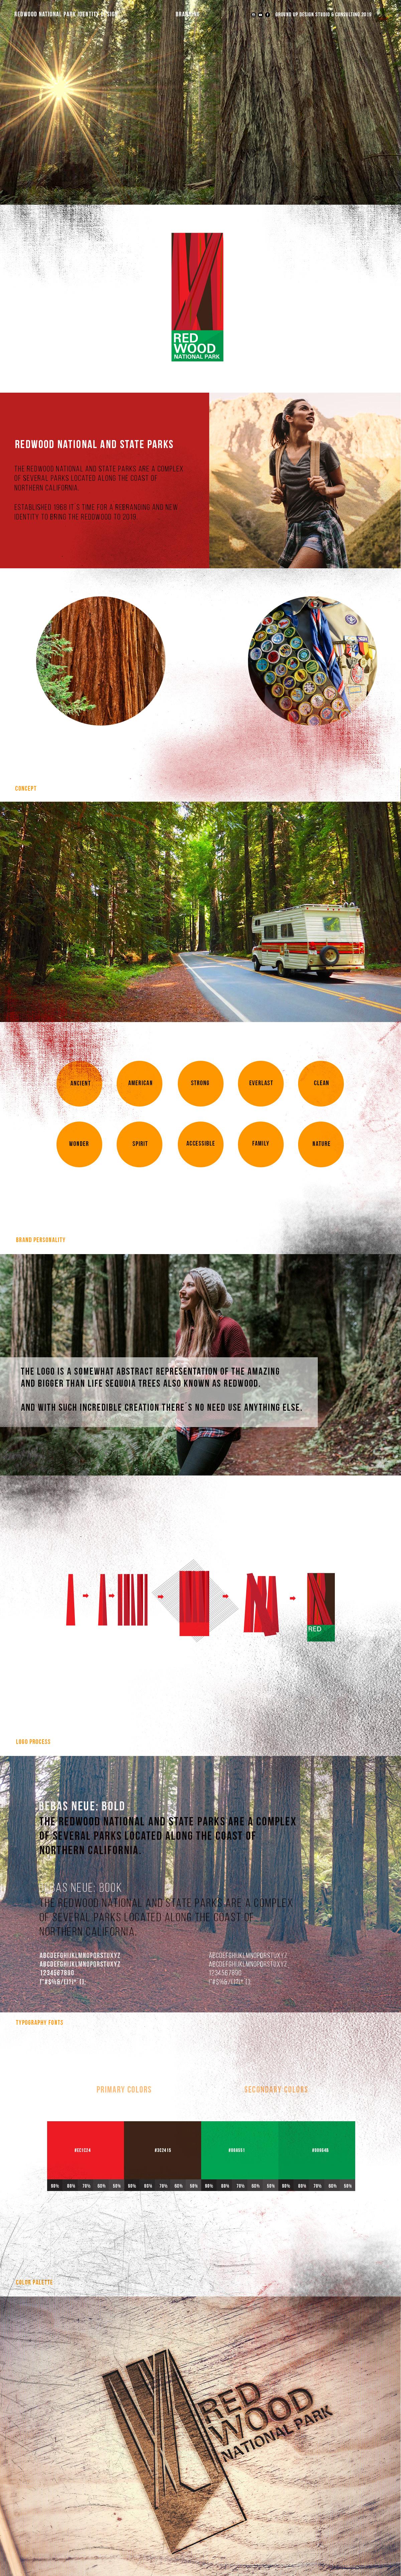 California redwood Park logo branding  identity national usa